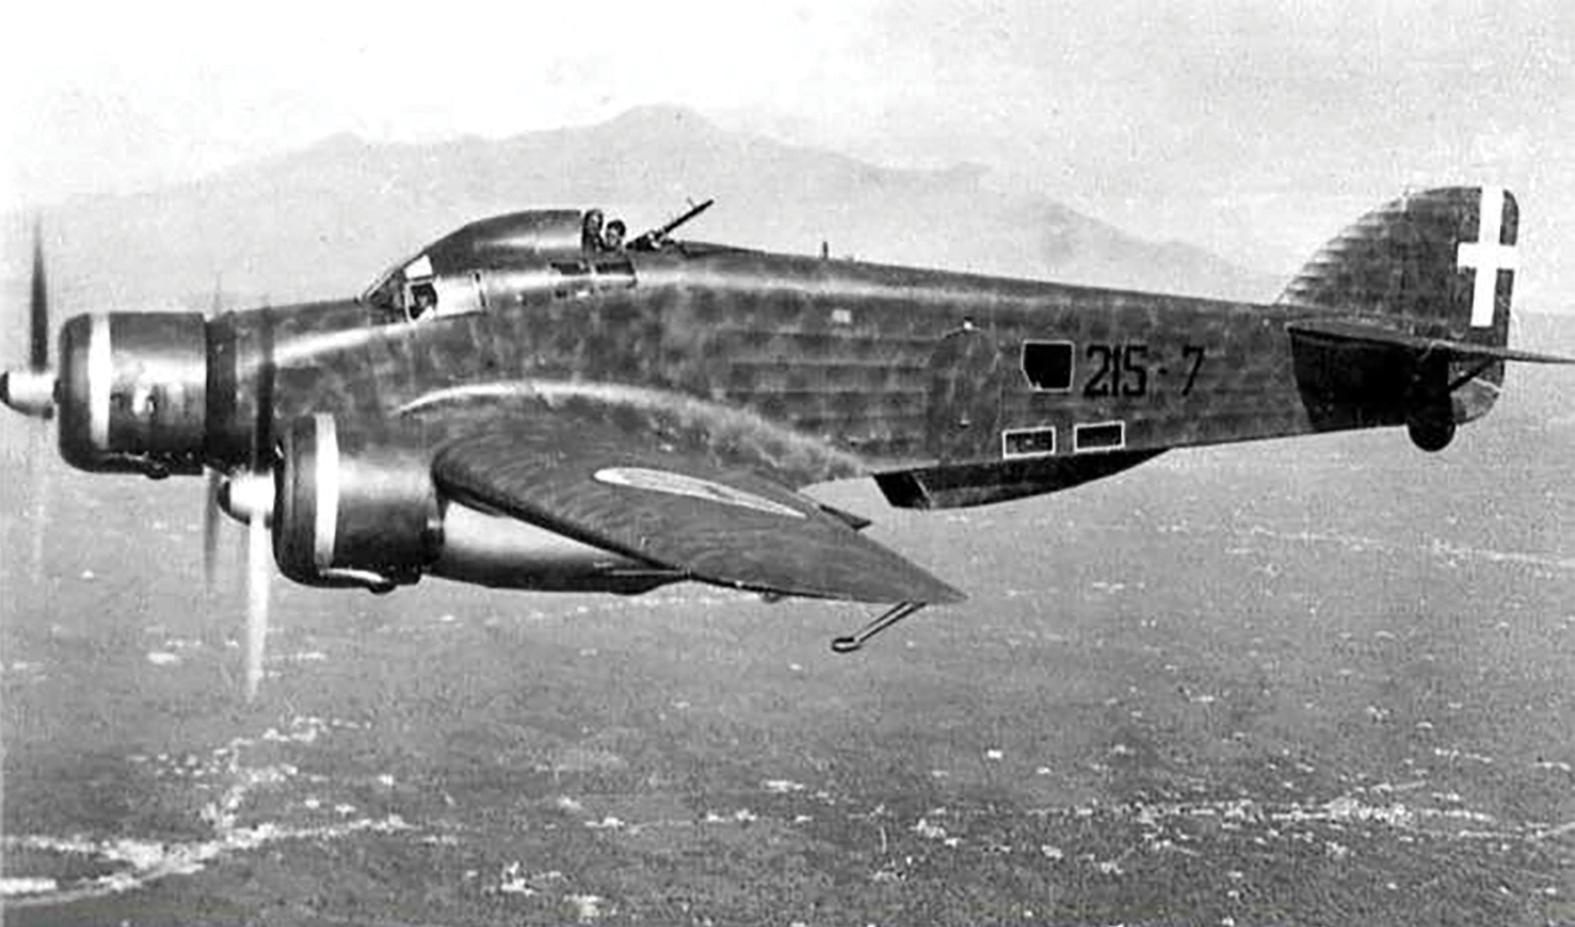 An Italian triple engine Savoia Marchetti SM79 similar to the one which flew over Malta on a reconnaissance flight. Source: www.facebook.com/Regia. Aeronautica.1923.46/photos